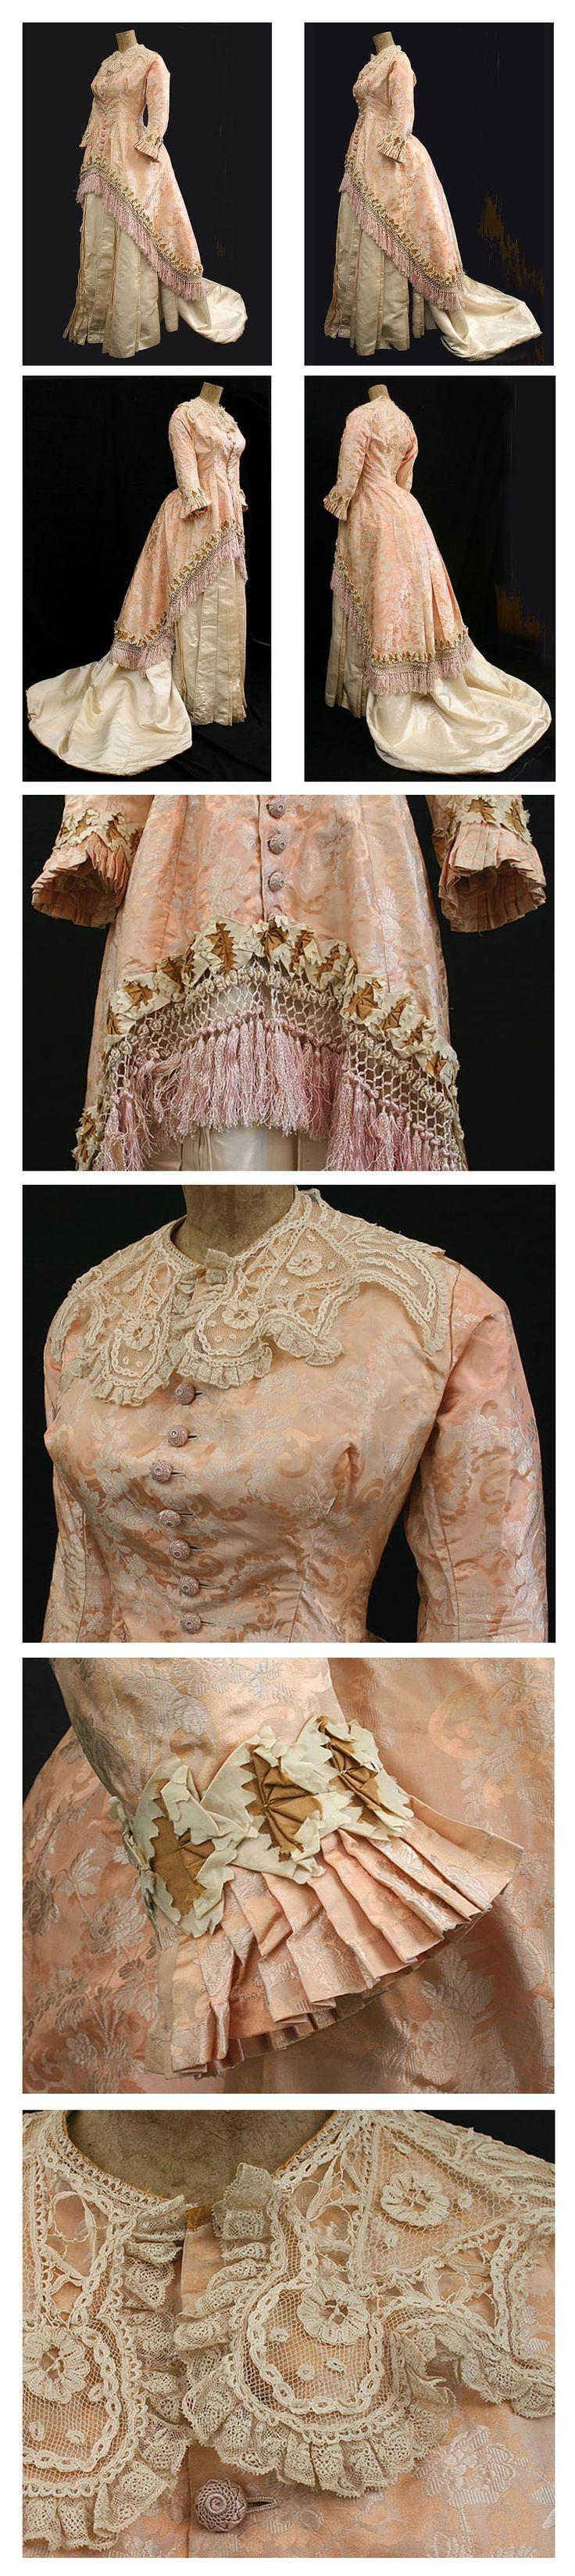 ~Silk brocade/satin two-piece gown, c.1880 vintagetextile.com~